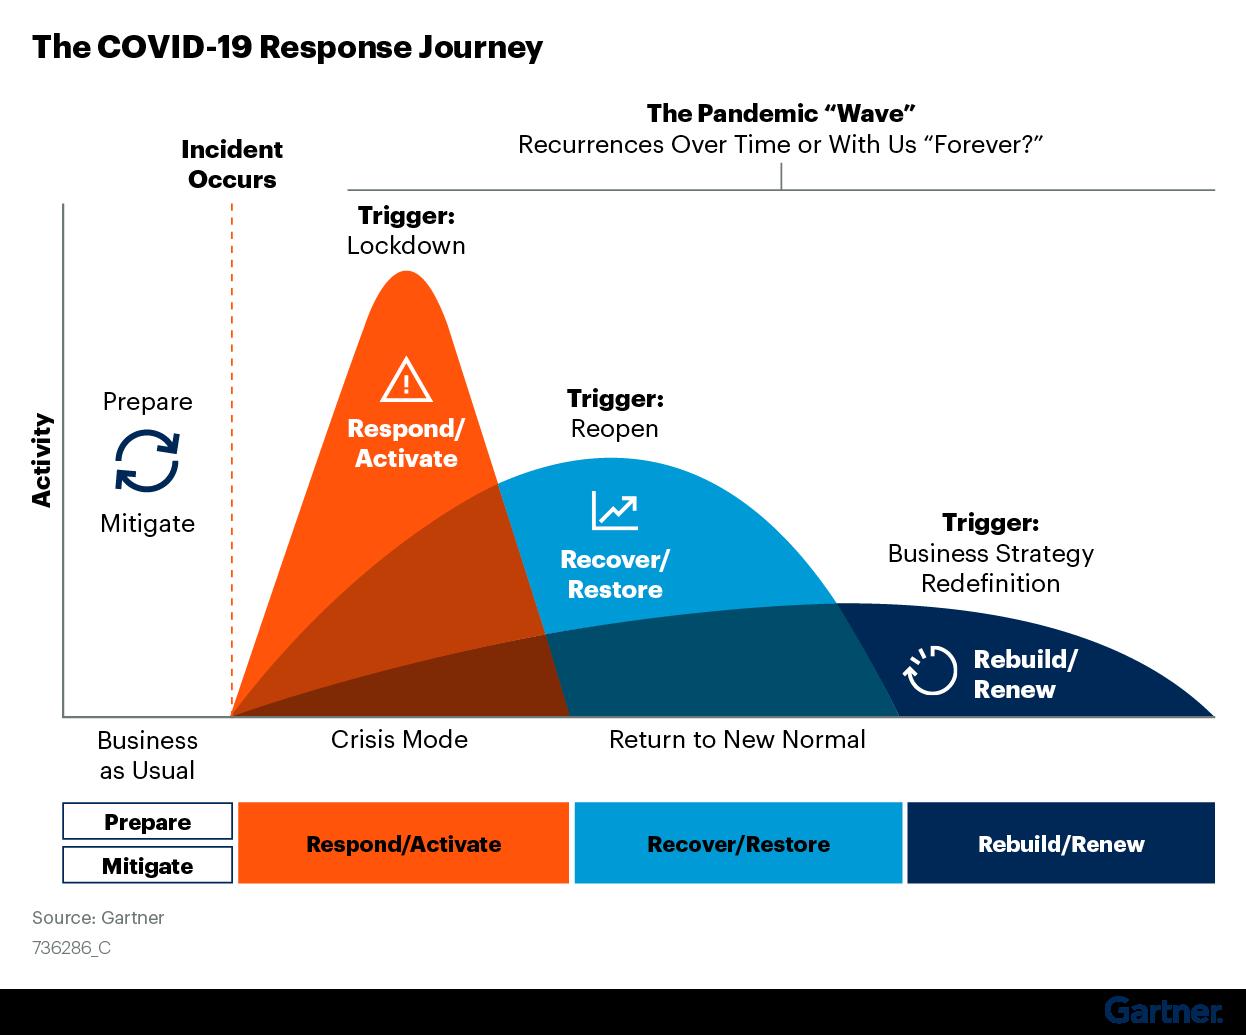 Figure 2: The COVID-19 Response Journey